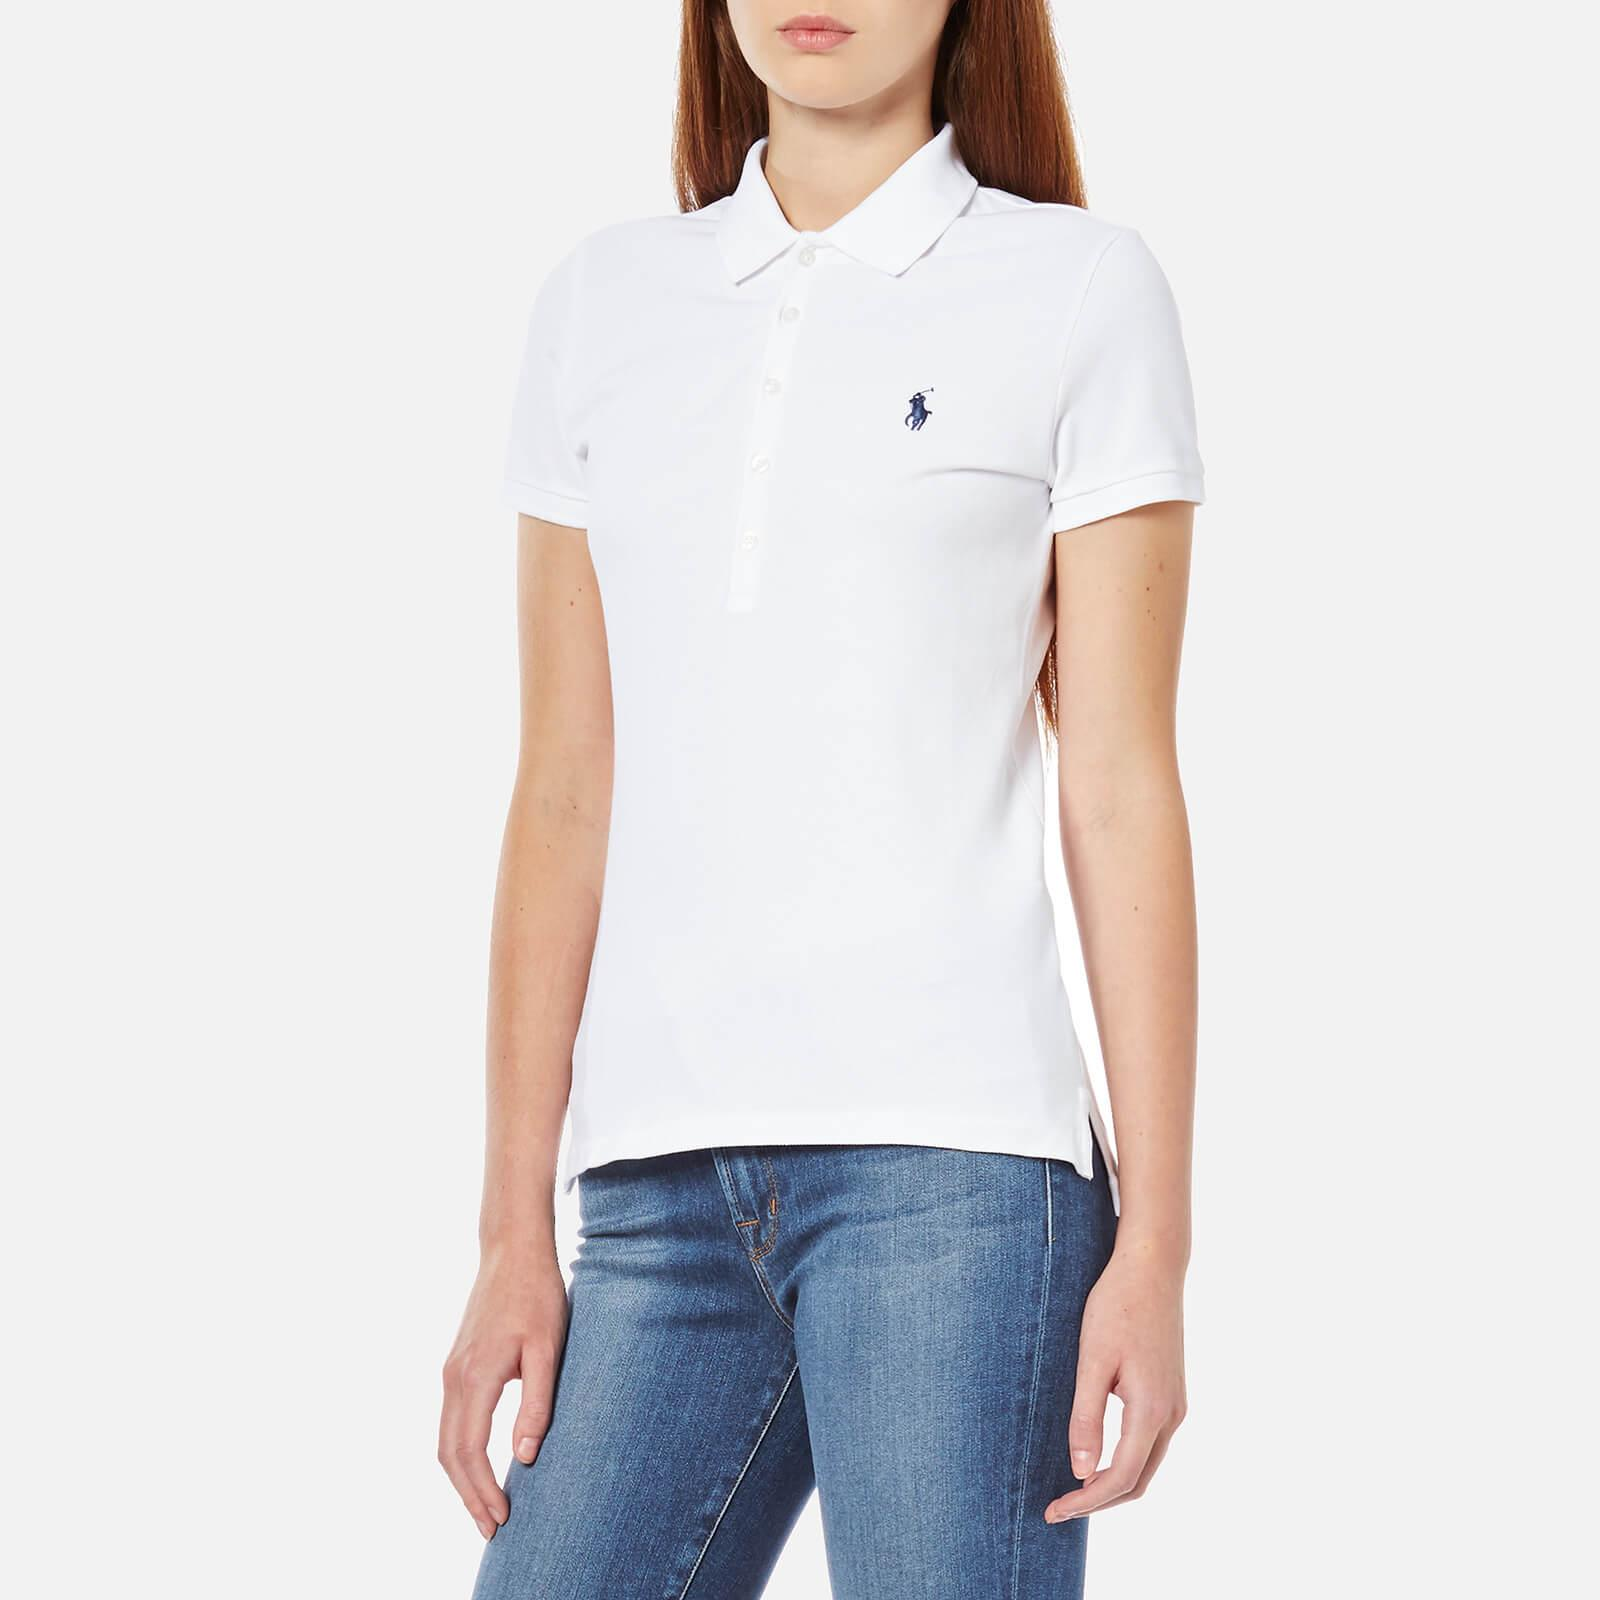 Polo Ralph Julie White Shirt Lauren 7ybfgvIY6